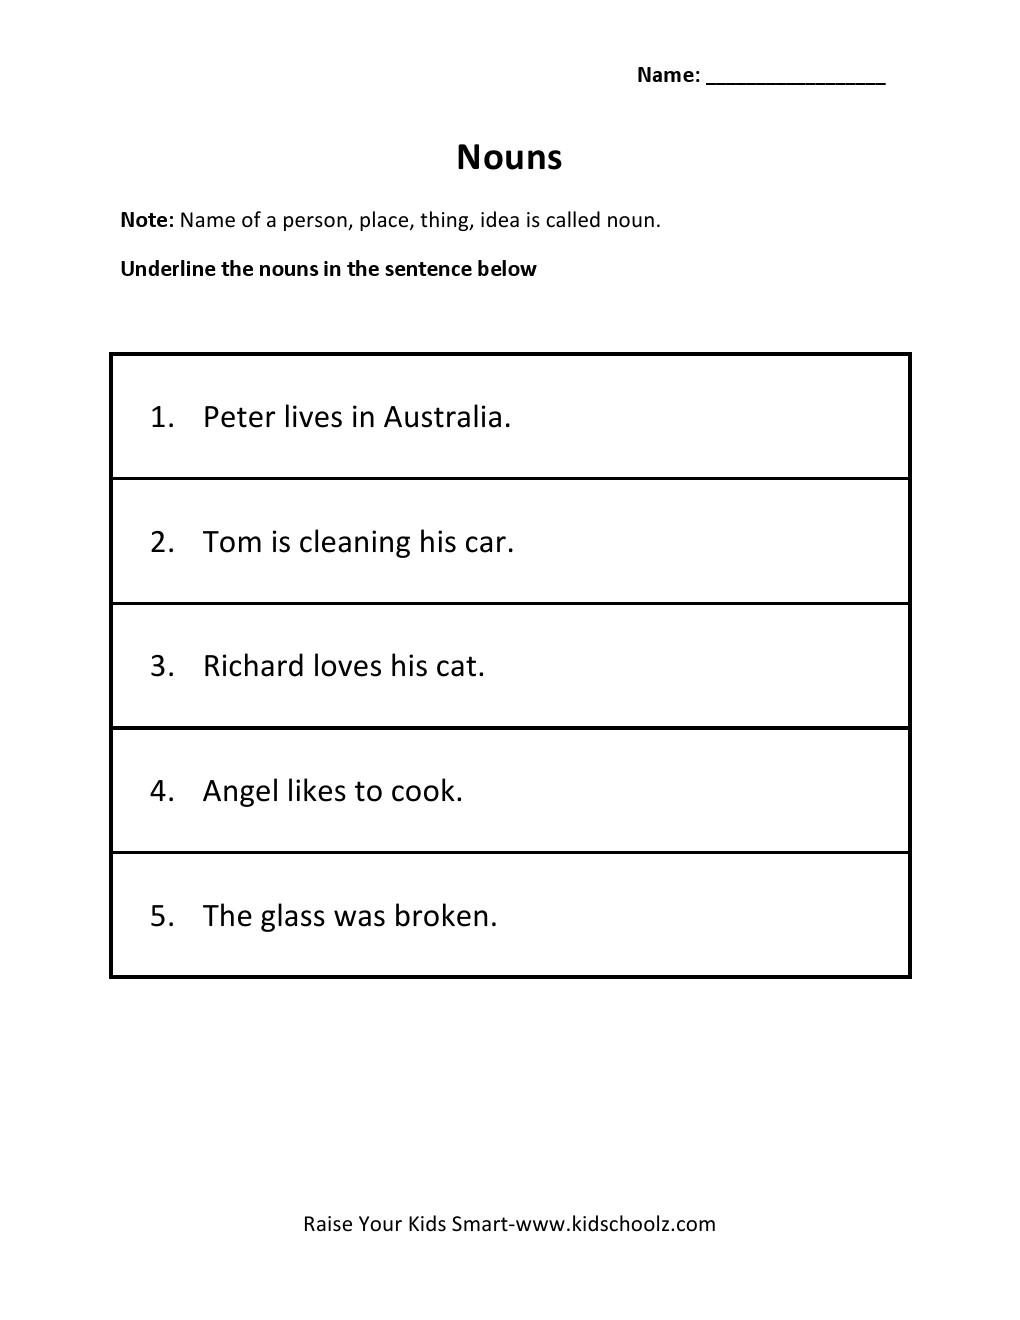 Grade 2 - Underline Nouns Worksheet 2 - KidschoolzKidschoolz alphabet worksheets, learning, worksheets, and free worksheets Underline The Nouns Worksheet 2 1320 x 1020